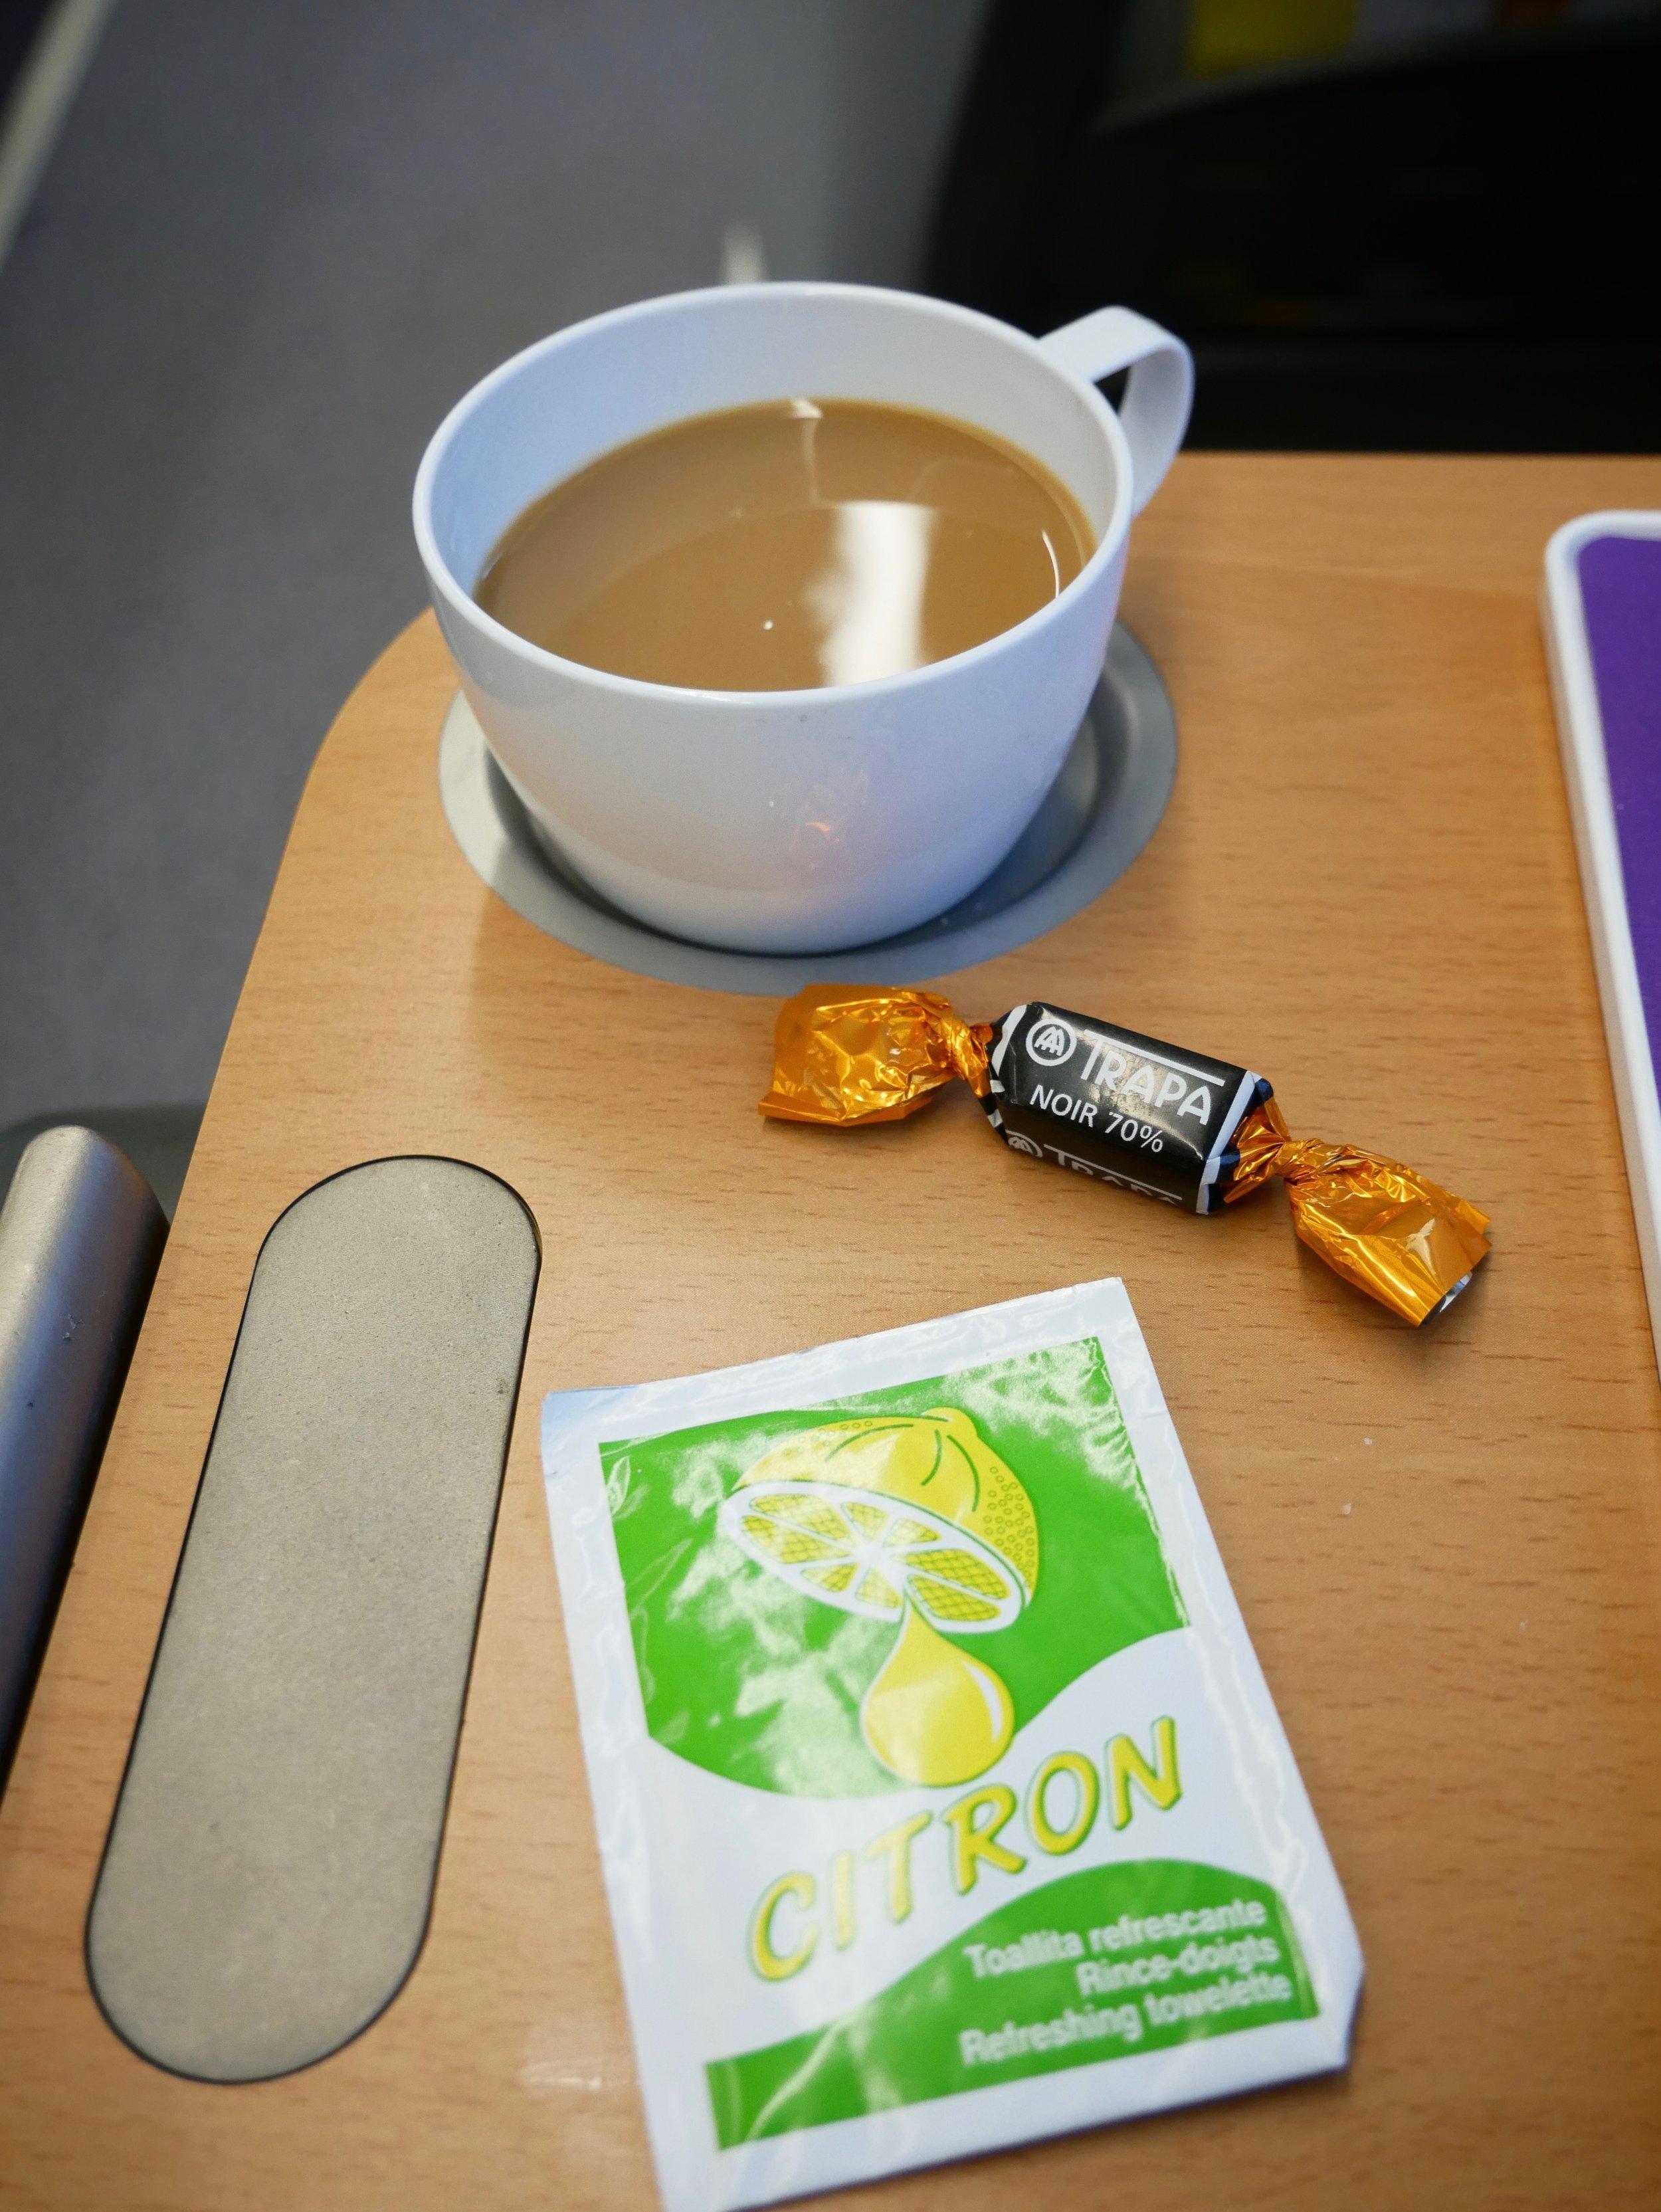 Euromed breakfast second beverage